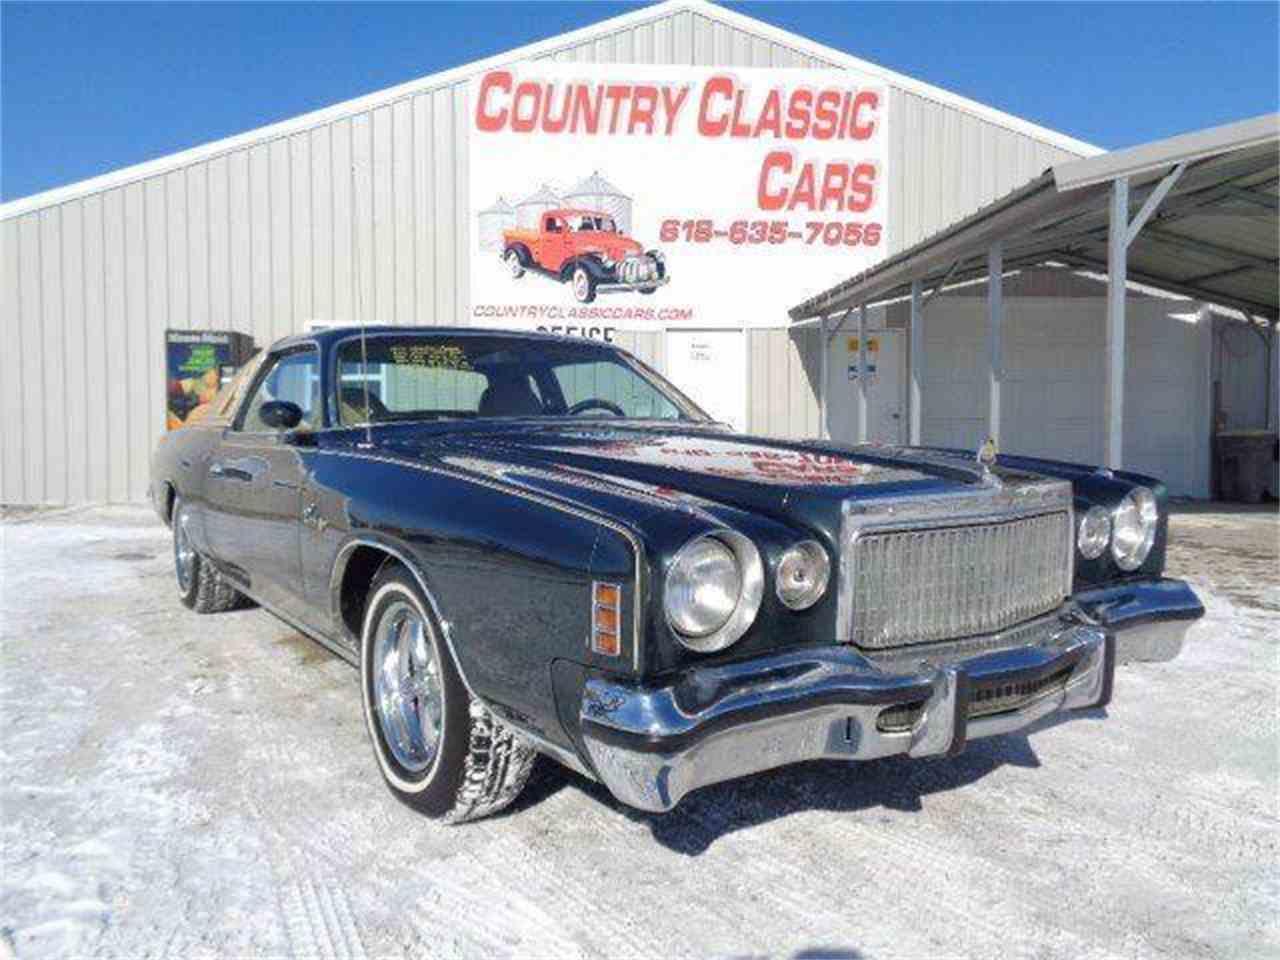 Classic Chrysler Cordoba for Sale on ClassicCars.com